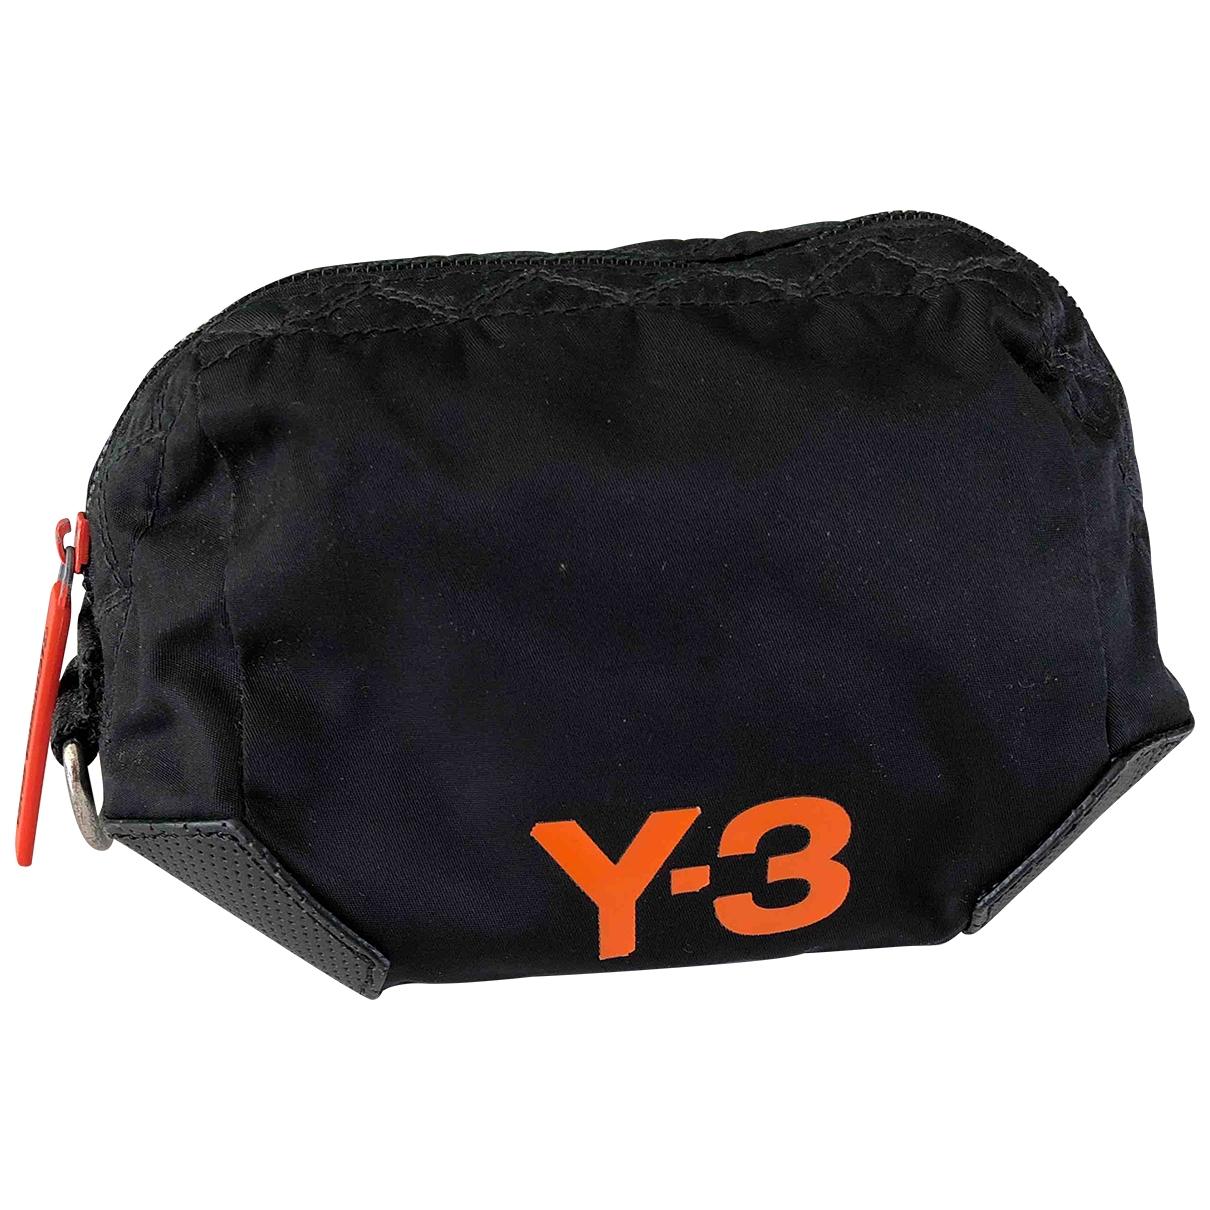 Y-3 By Yohji Yamamoto - Petite maroquinerie   pour homme - noir